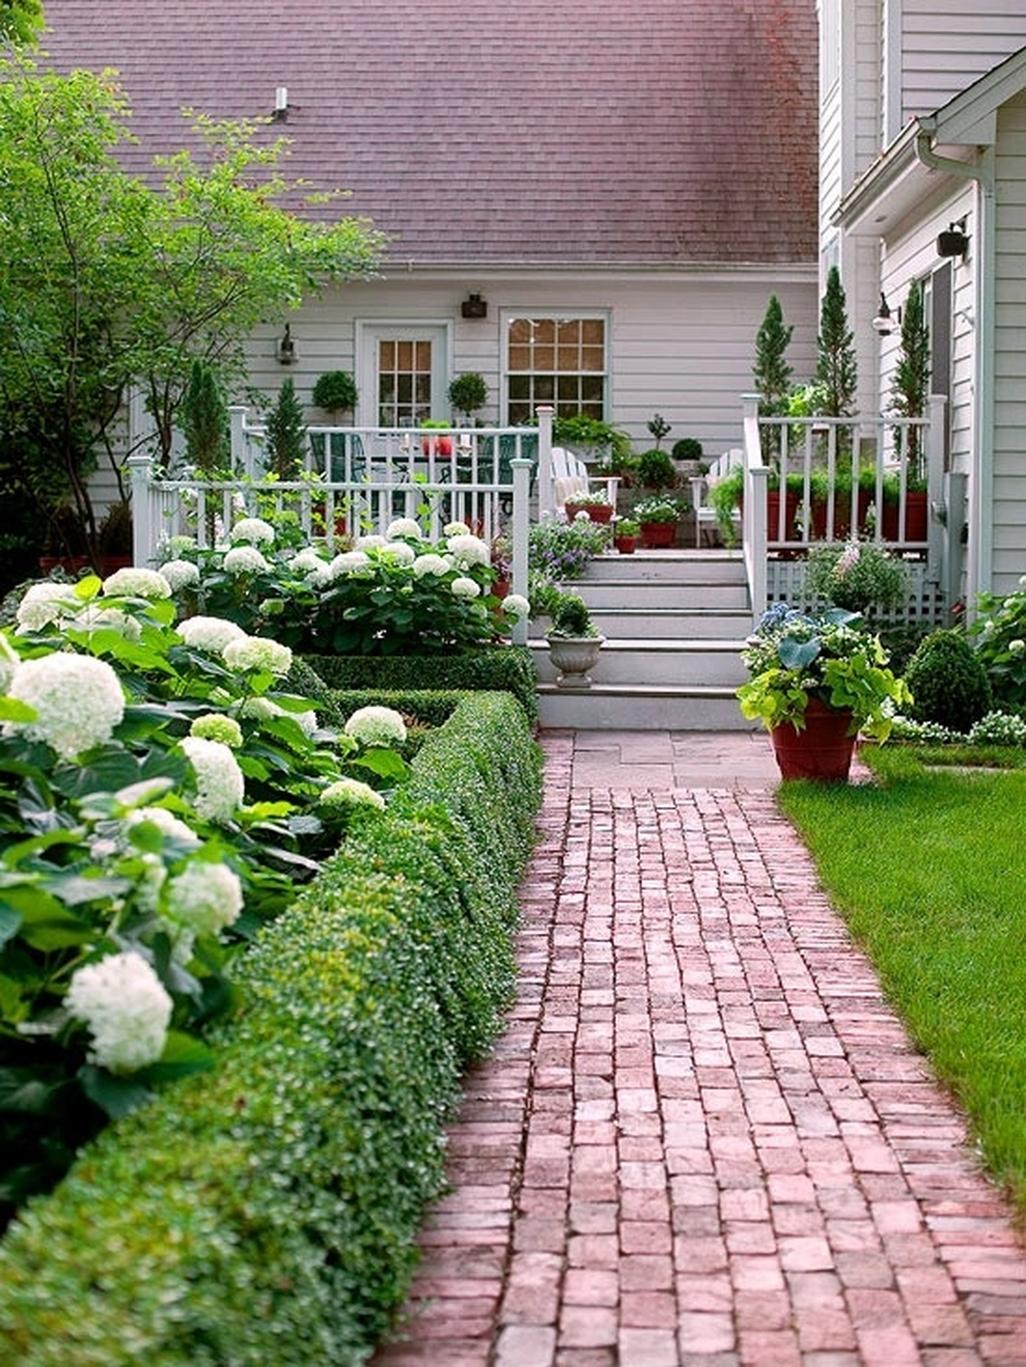 Stunning Front Yard Walkway Landscaping Design Ideas 09